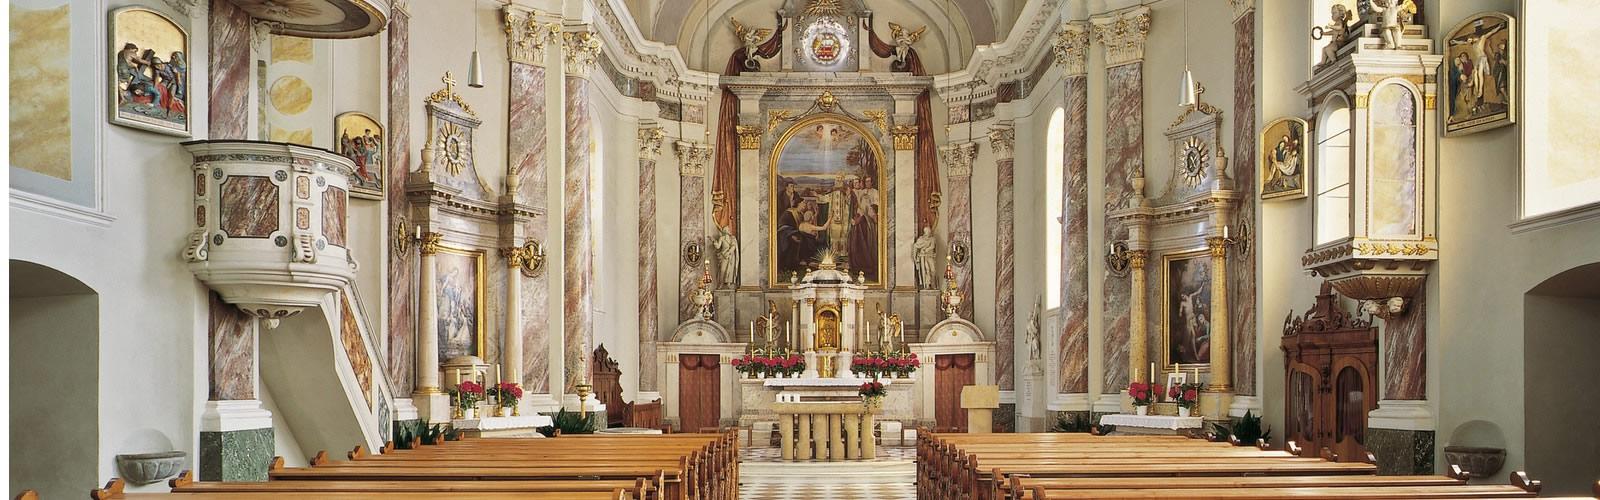 Chiesa Nalles